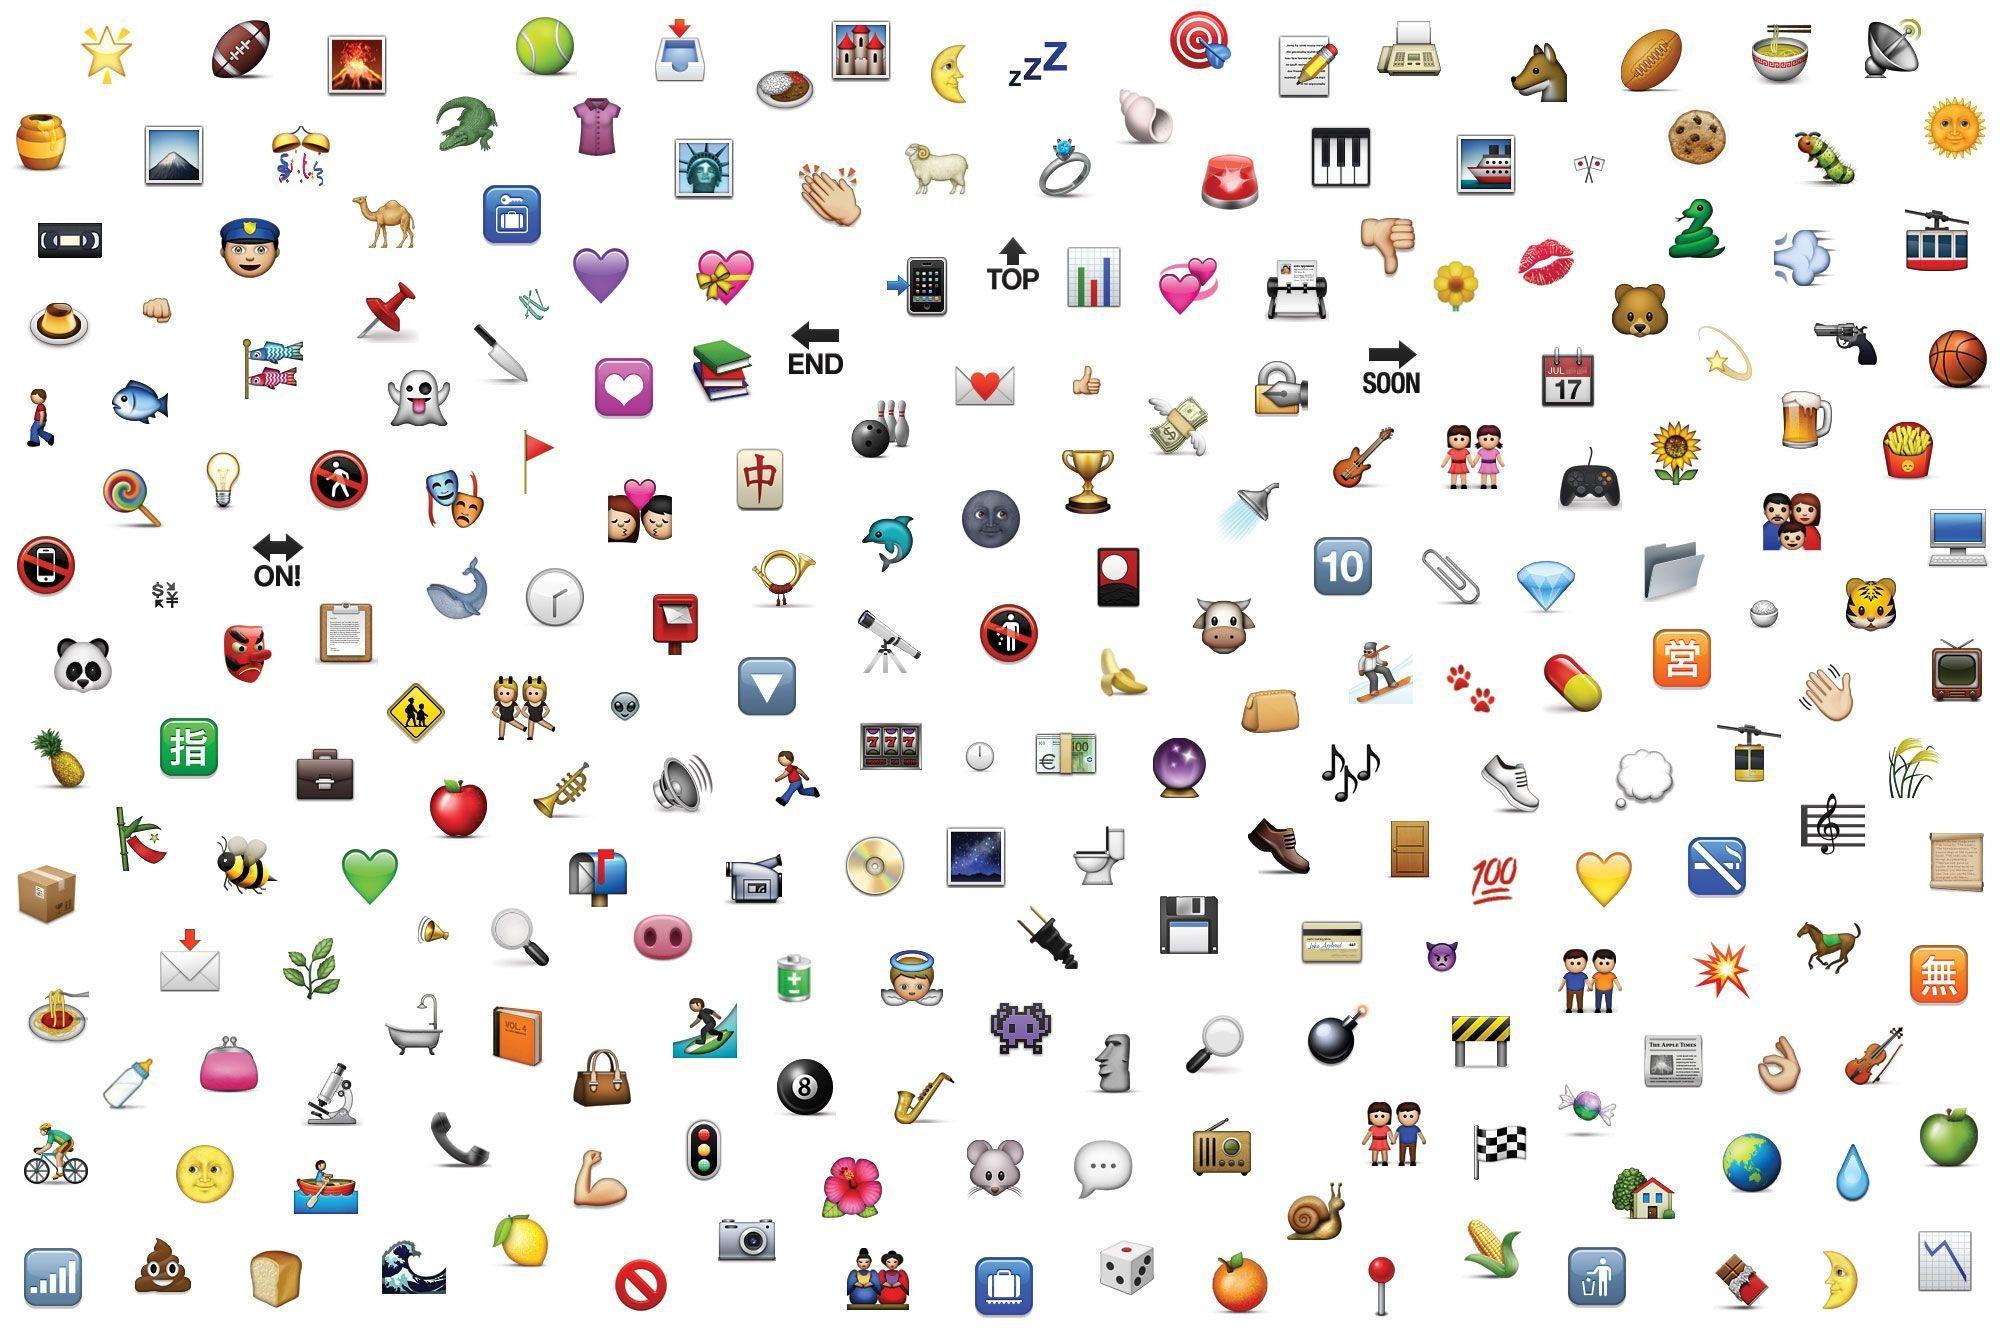 100 emoji wallpaper 48 images 2560x2048 100 emoji symbol buycottarizona